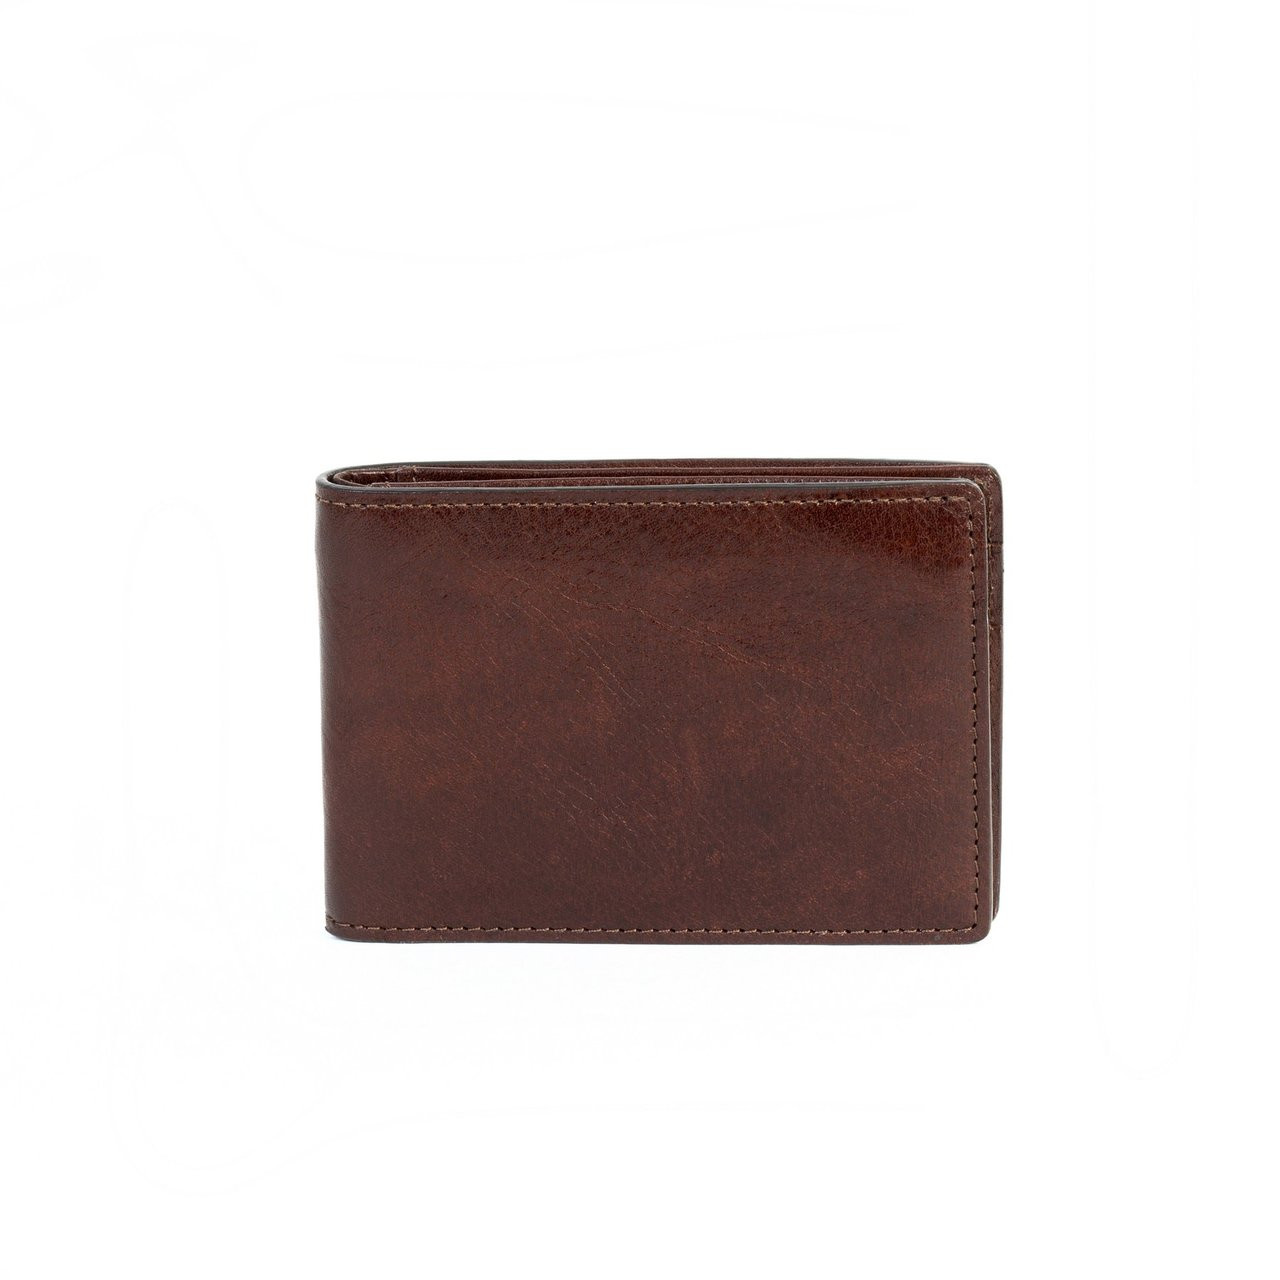 086853392d6f Boconi Becker Slimster Wallet